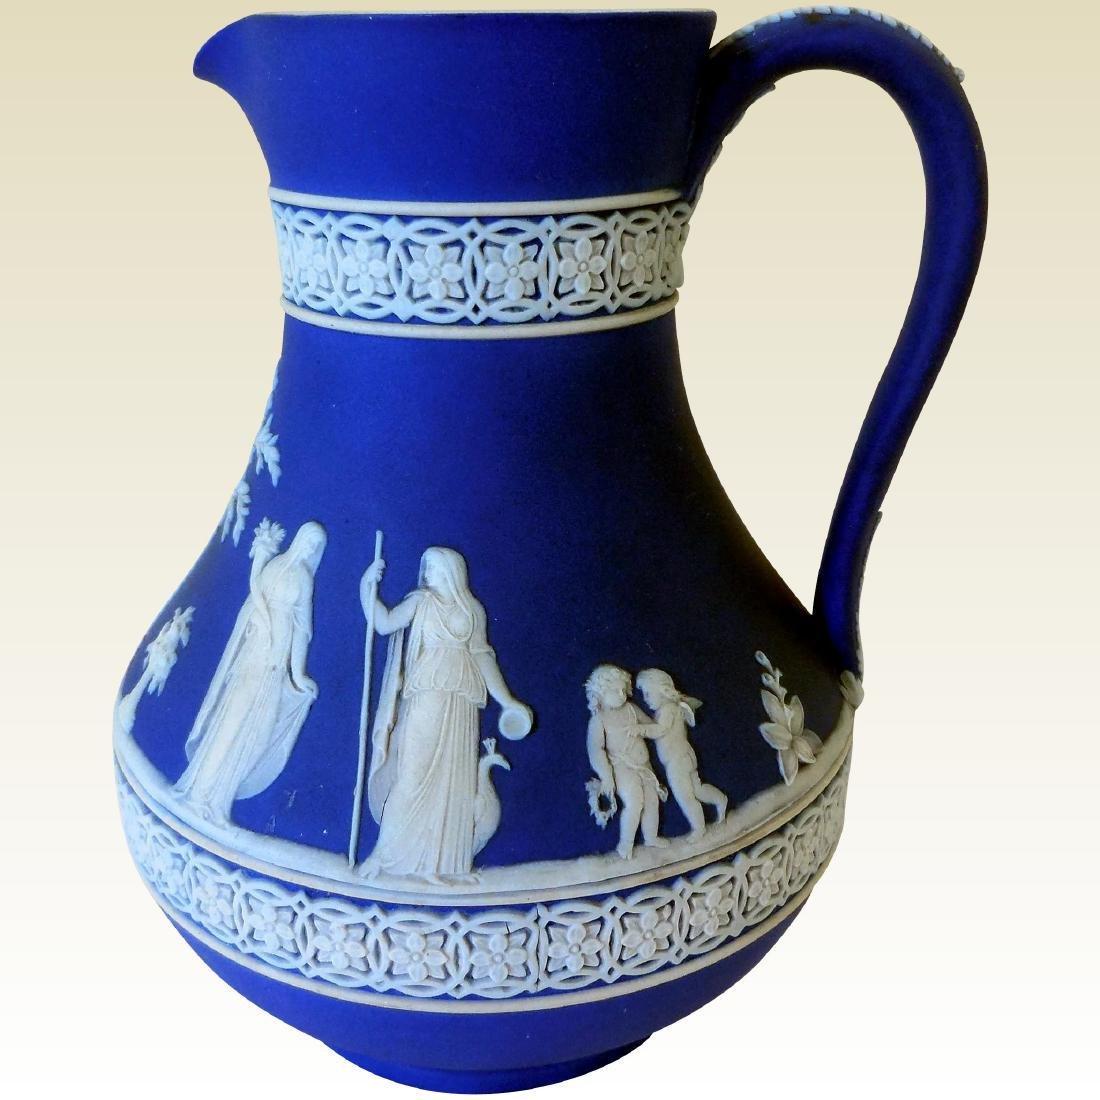 Wedgwood Dark Blue Jasperware Pitcher